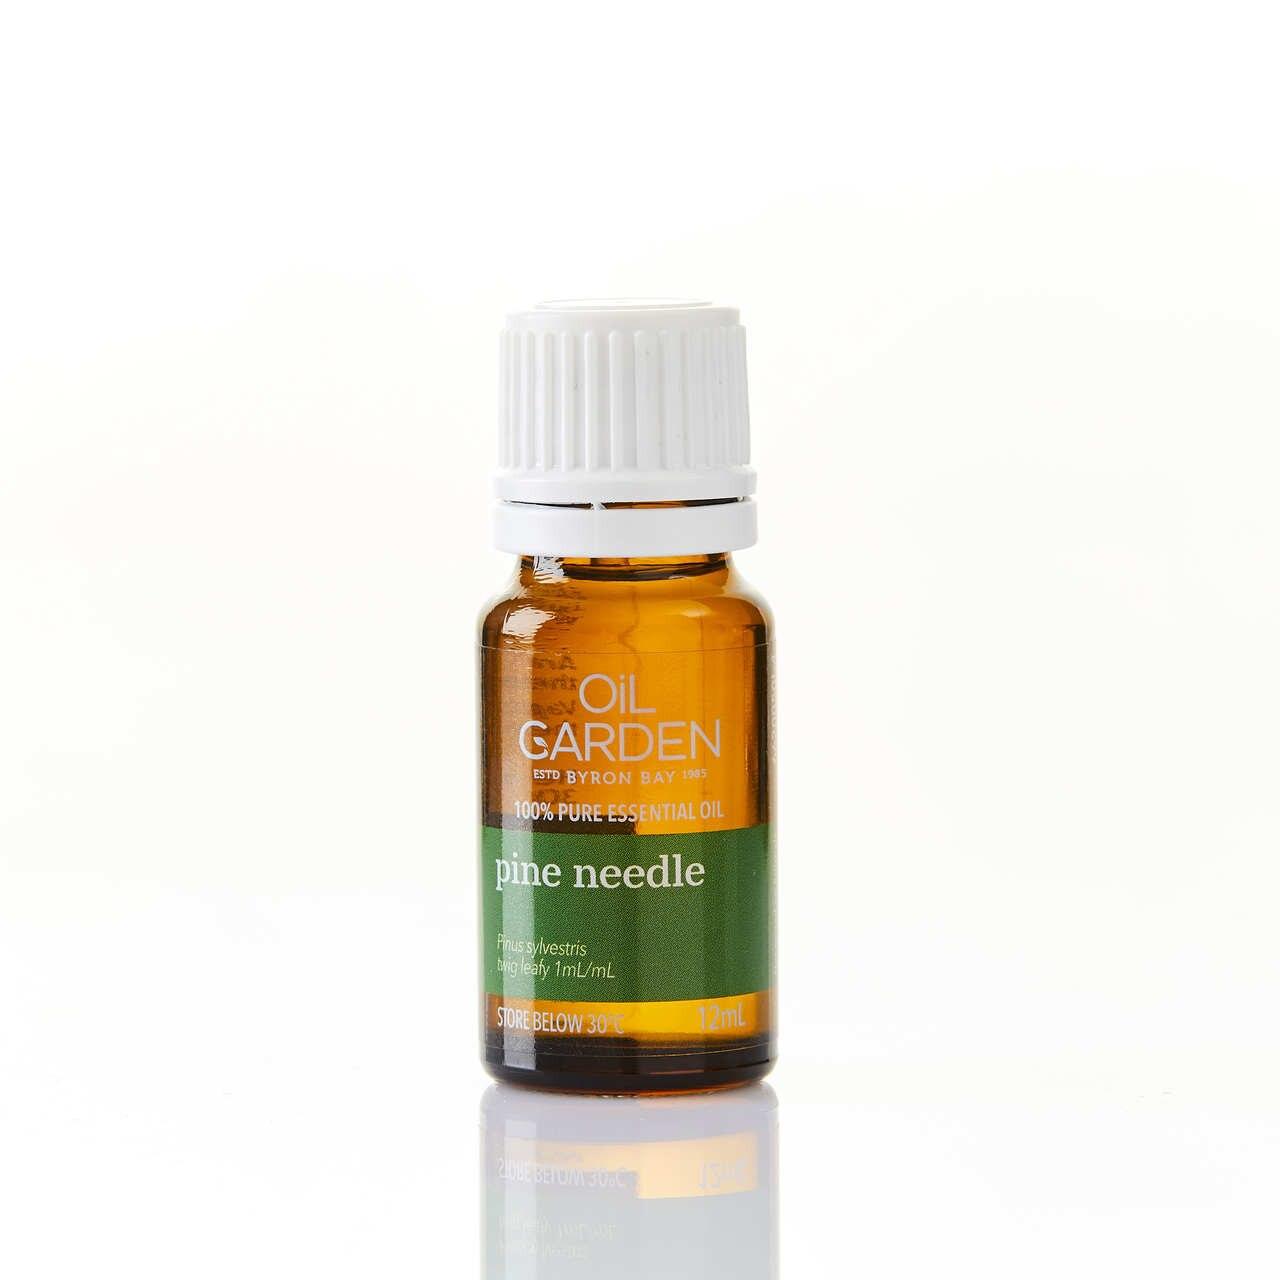 Oil Garden Pine Needle Pure Essential Oil 12mL 6620050